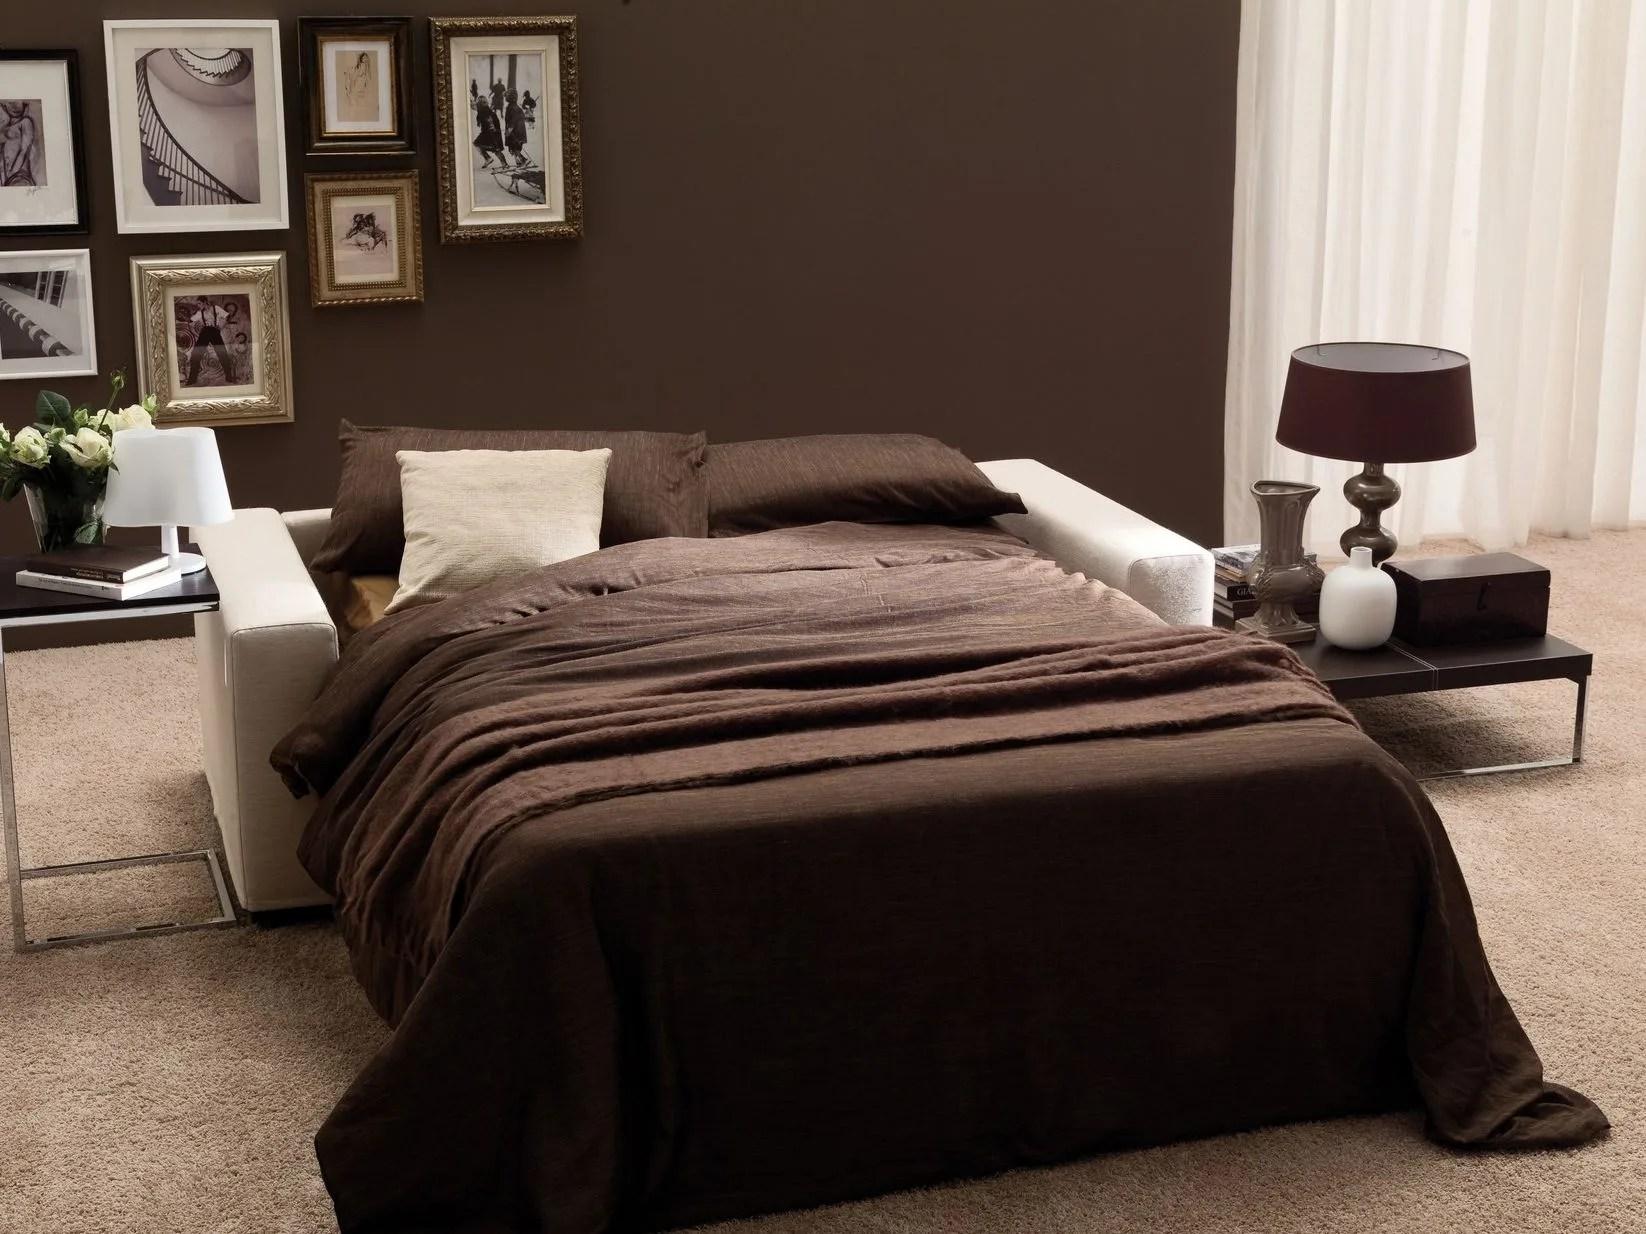 casa italy sofa bed mattresses corner elko by bontempi design erresse studio